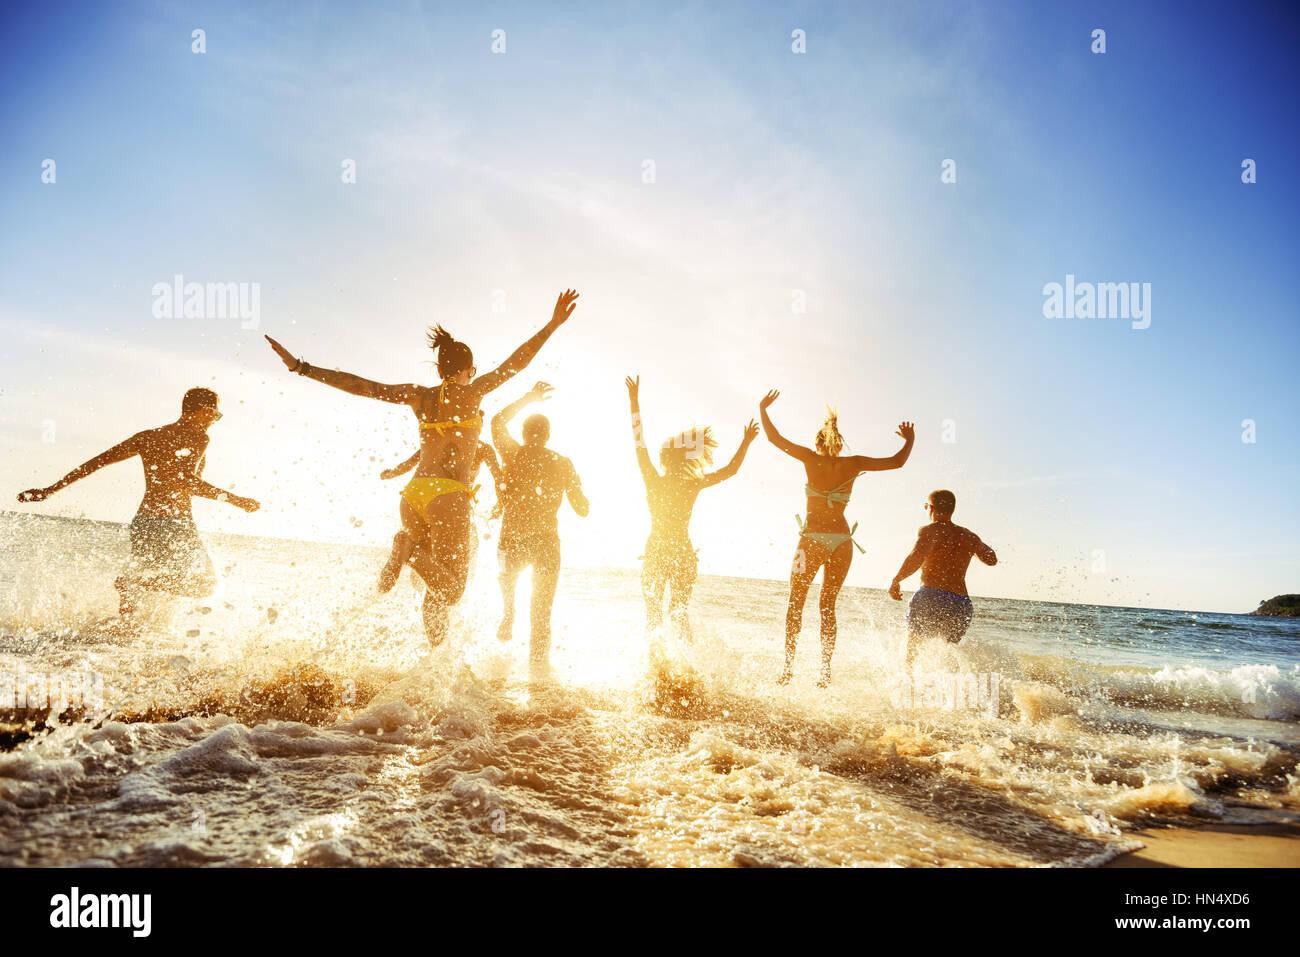 Foule de personnes amis sunset beach holidays Photo Stock